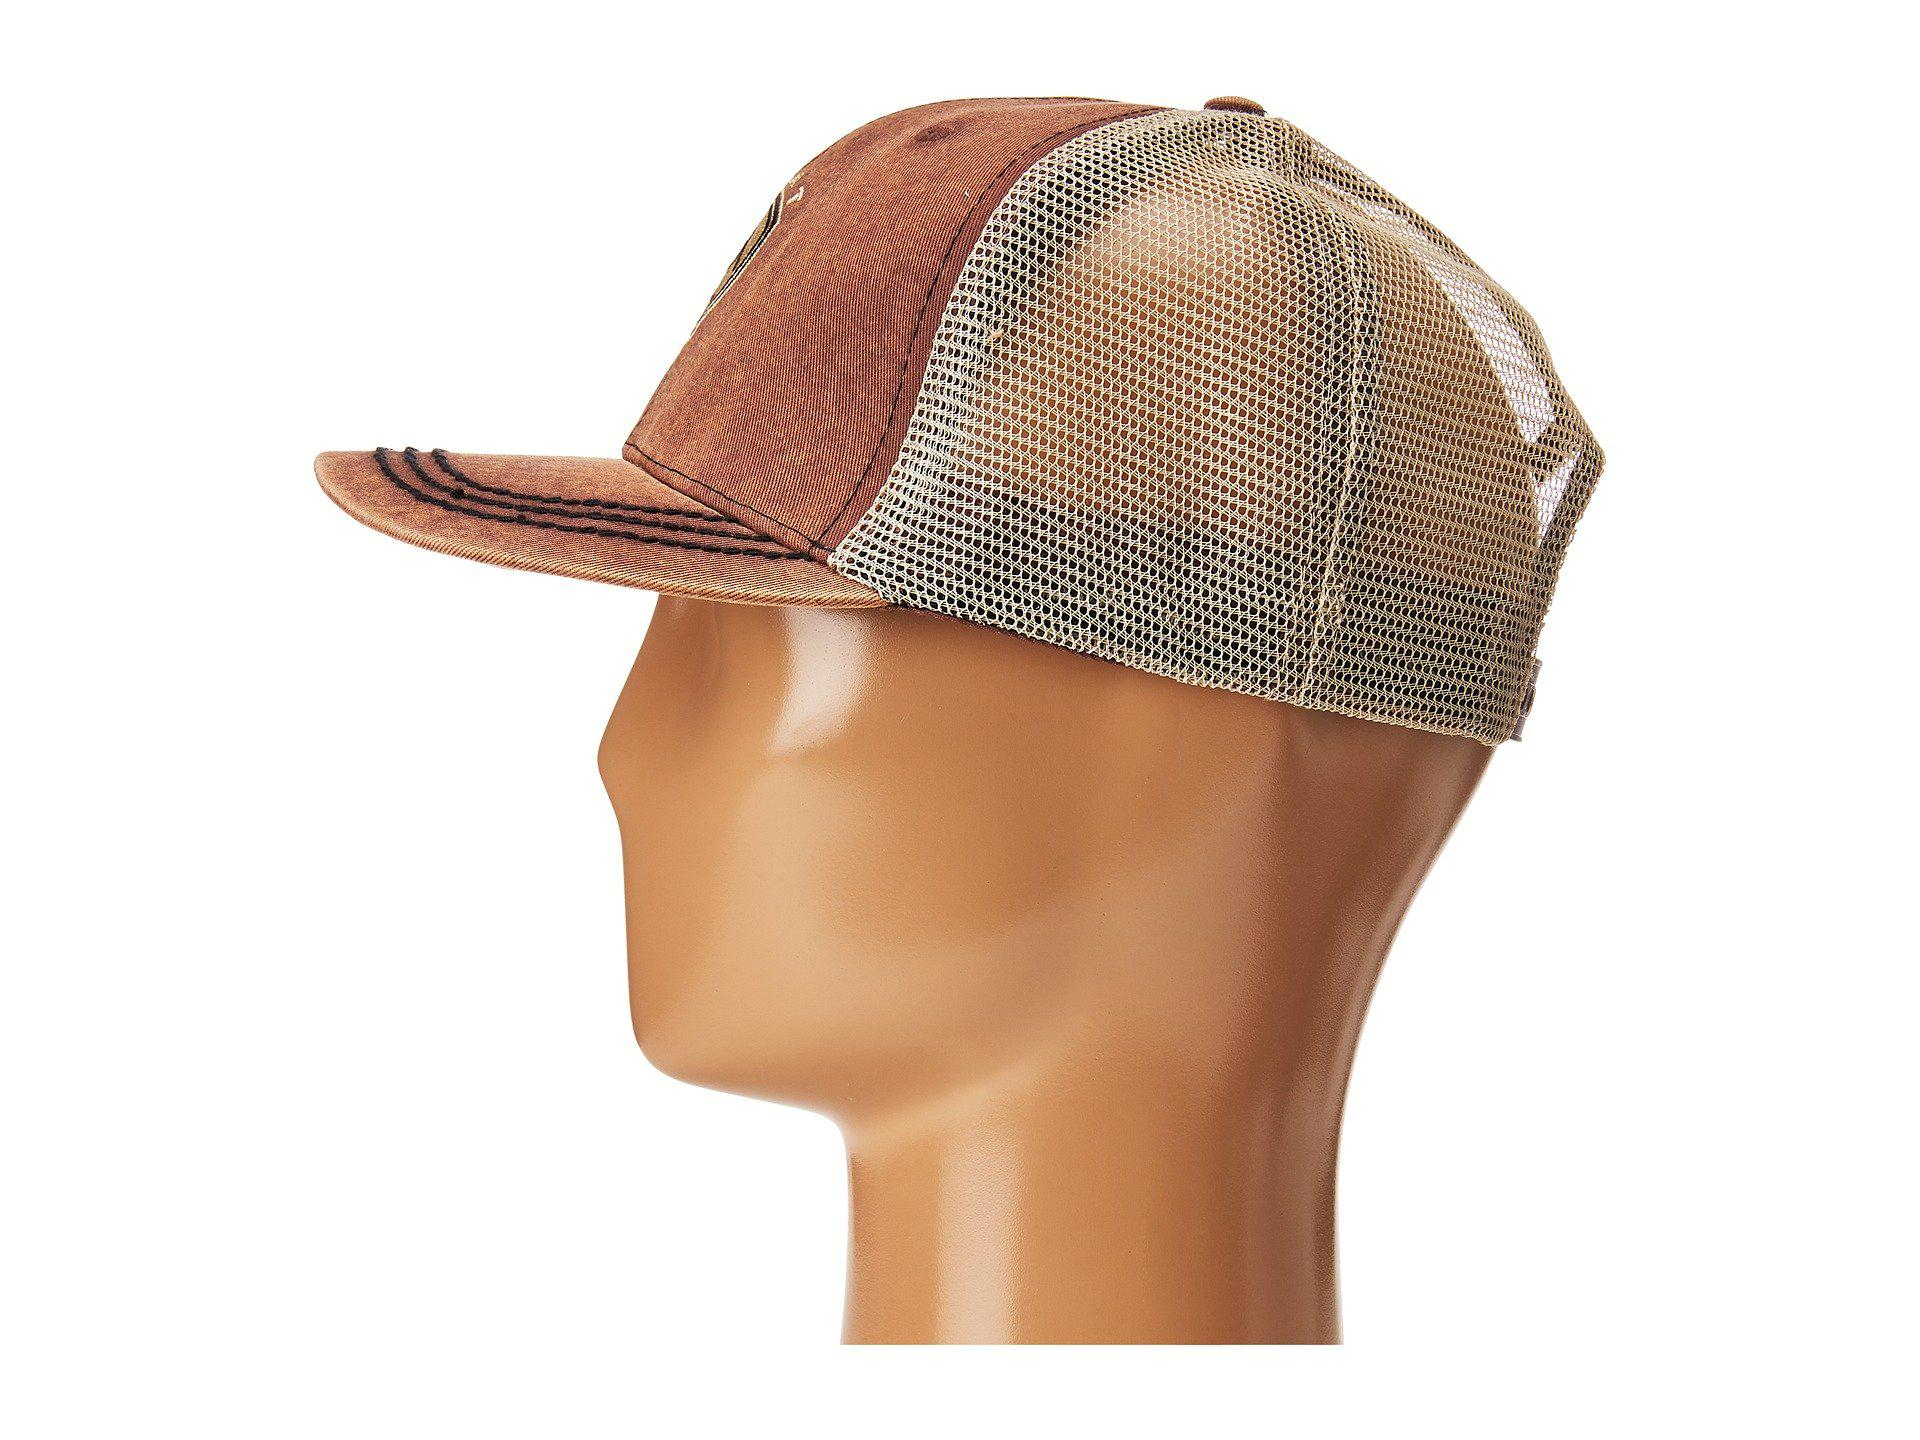 Ariat Western Hat Cap Mens Baseball Snap Back Adjustable Oil Skin Navy 1509502